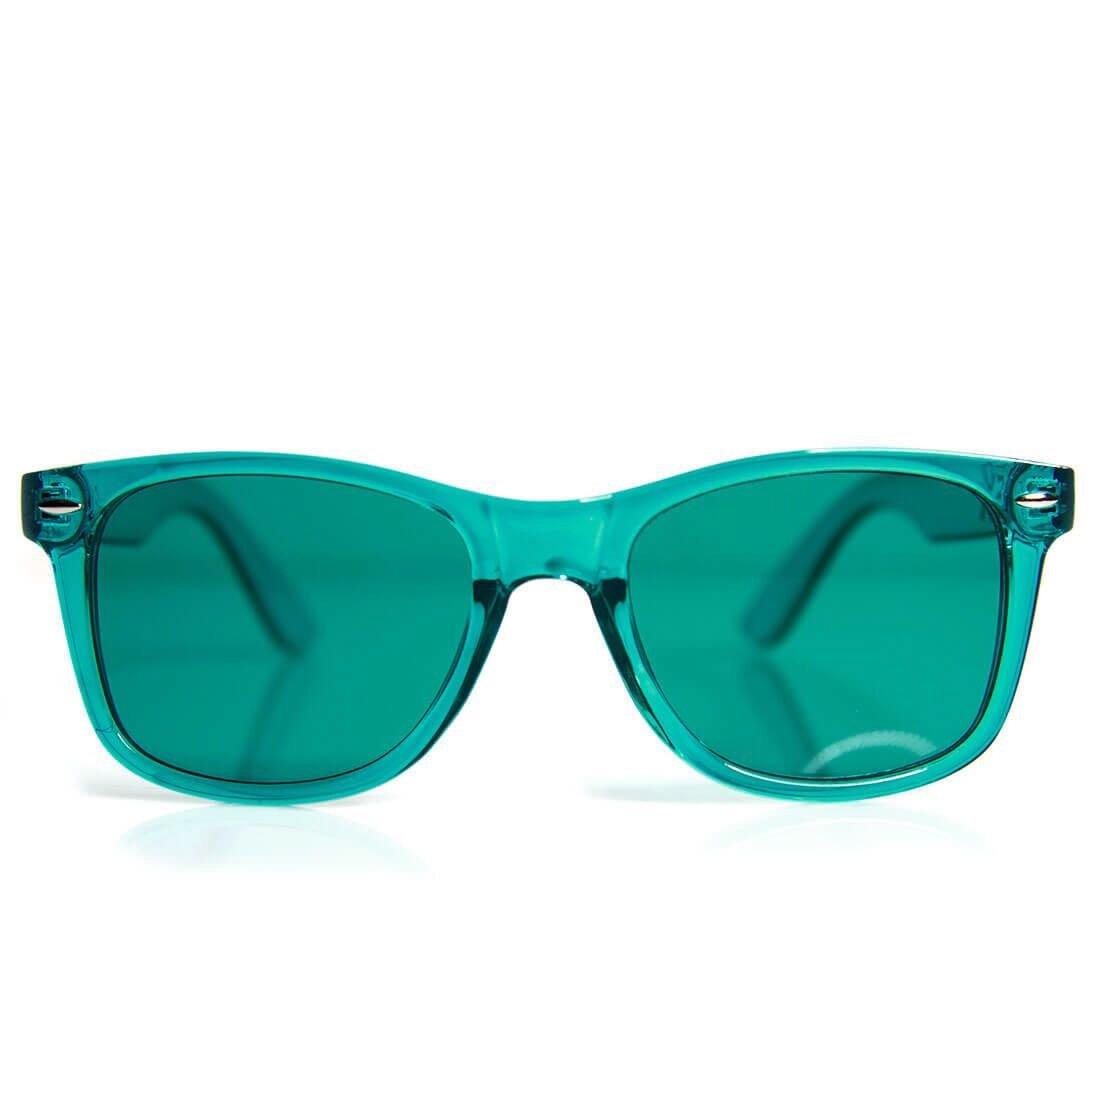 GloFX Aqua Color Therapy Glasses Chakra Glasses Relax Glasses